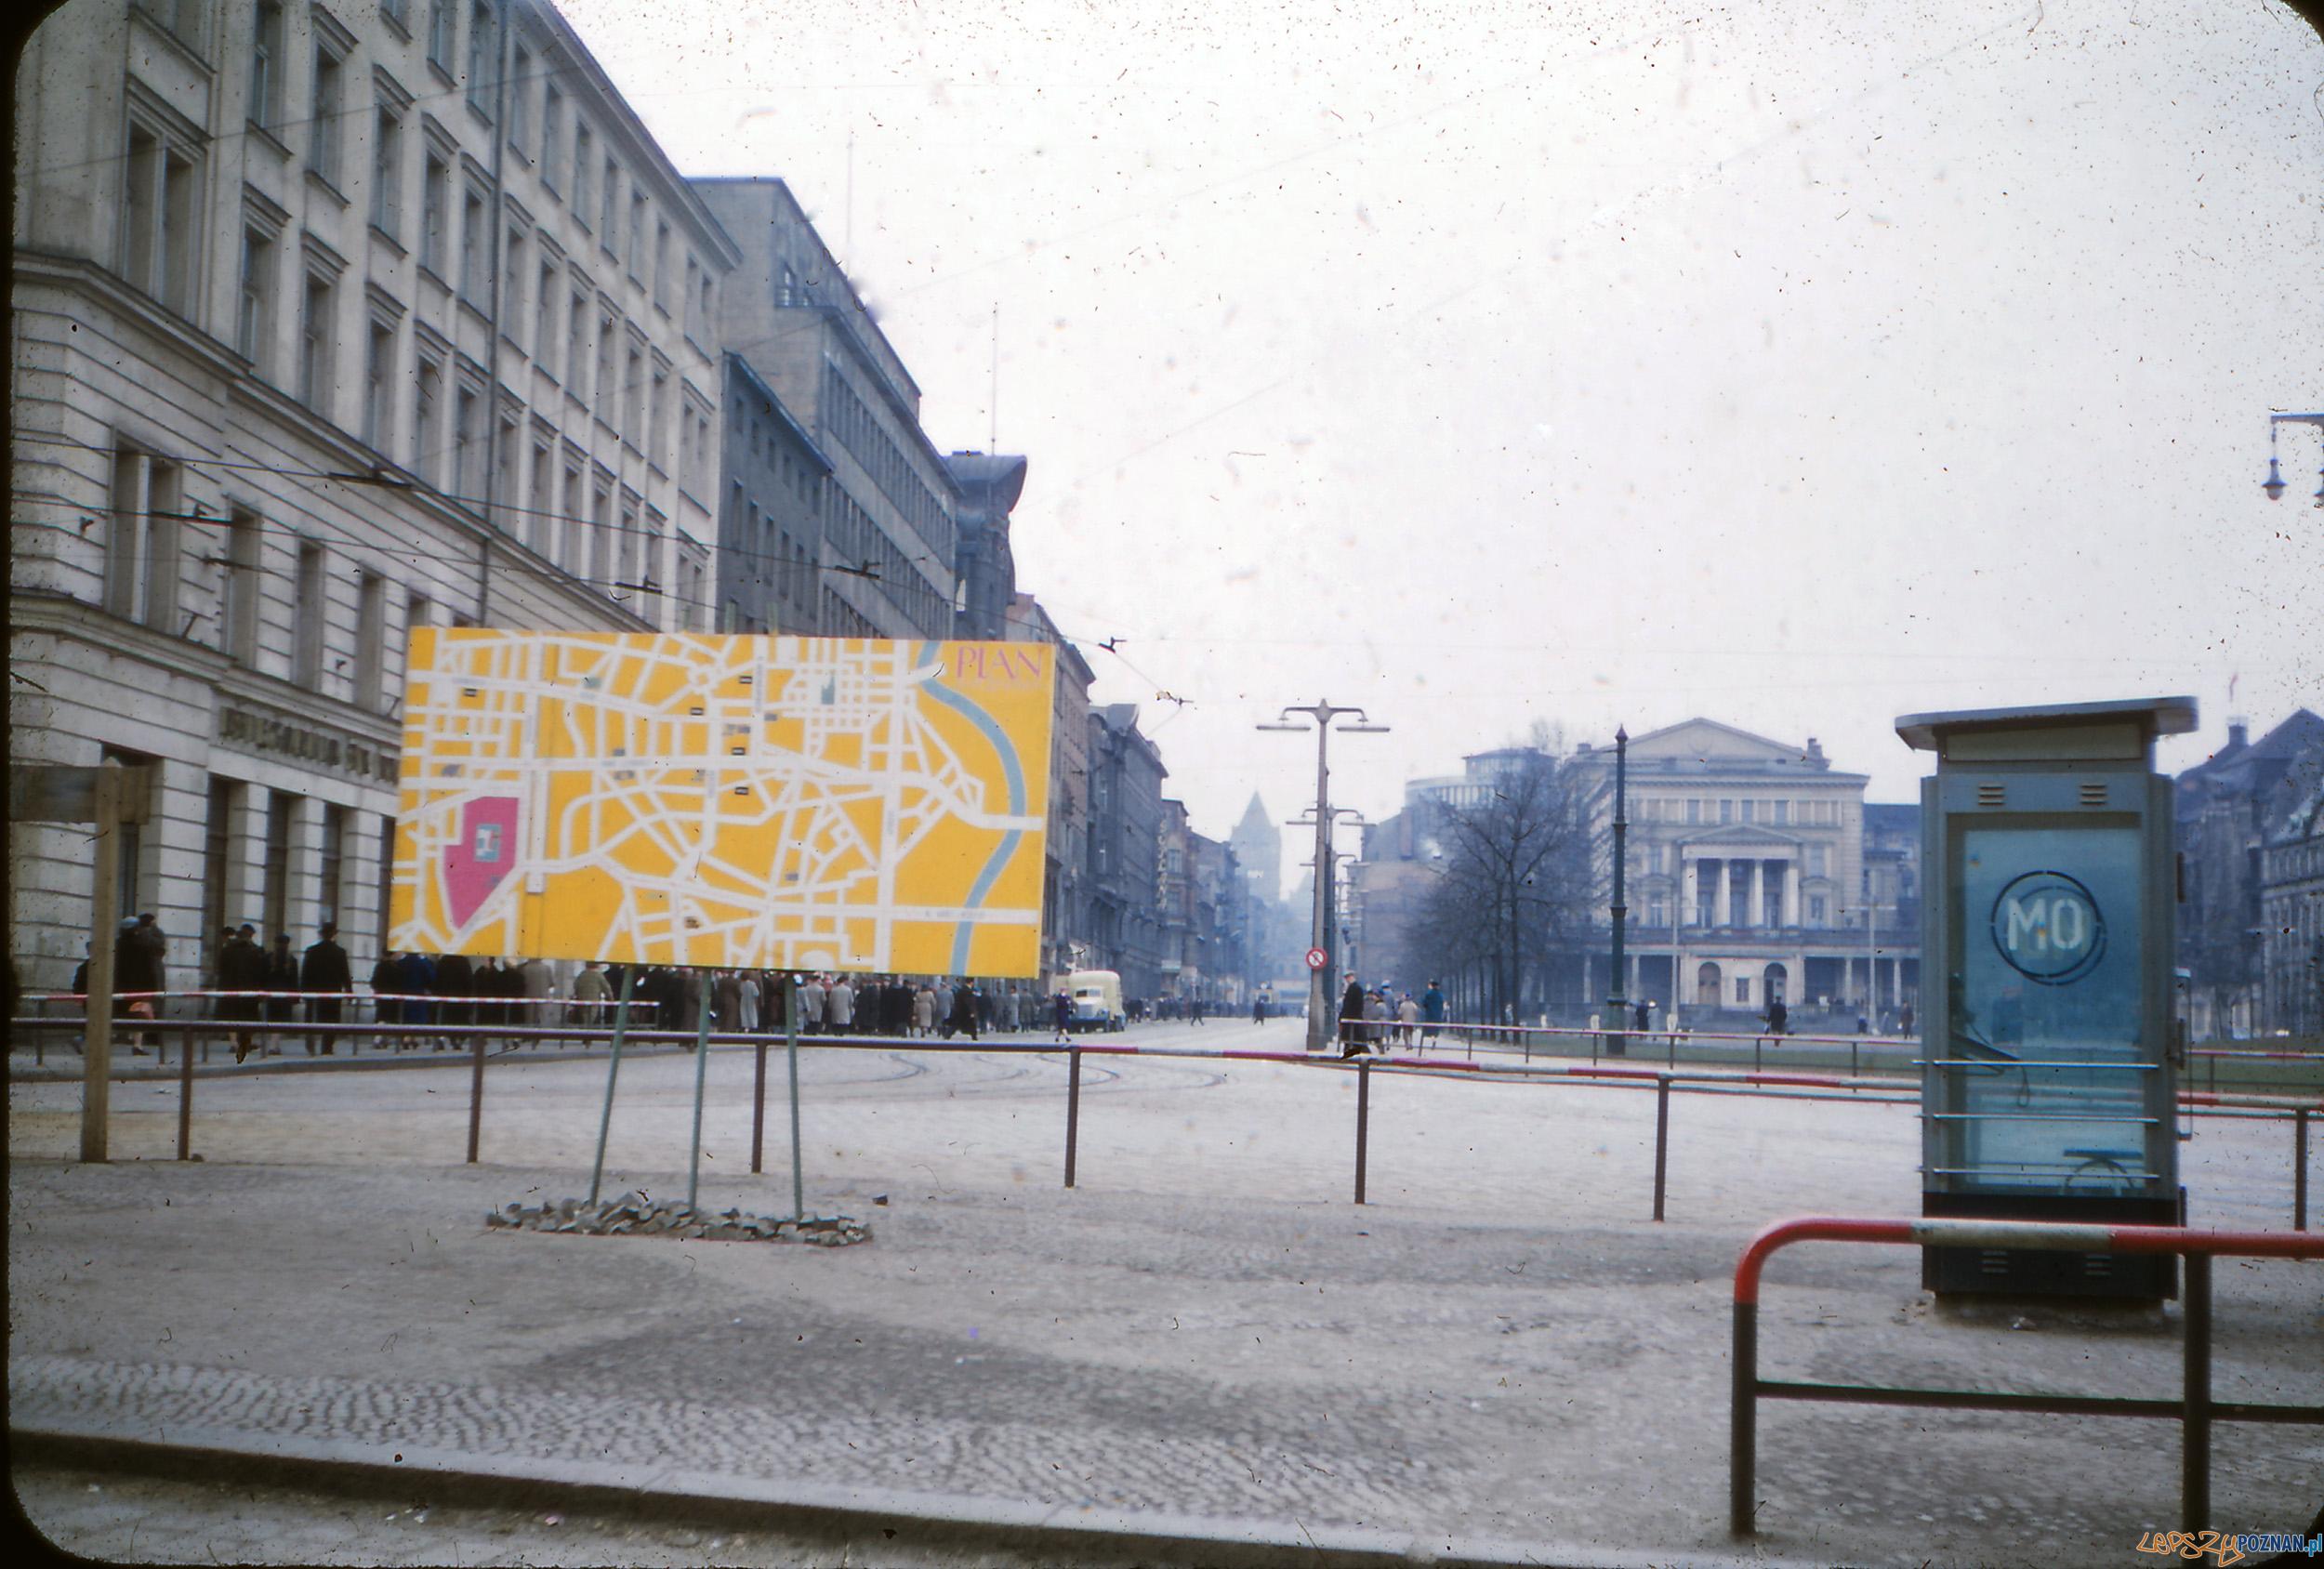 Plac Wolności - koniec lat 50-tych  Foto: Mogens Tørsleff, kolekcja Gorma Rudschinata / Flickr / CC